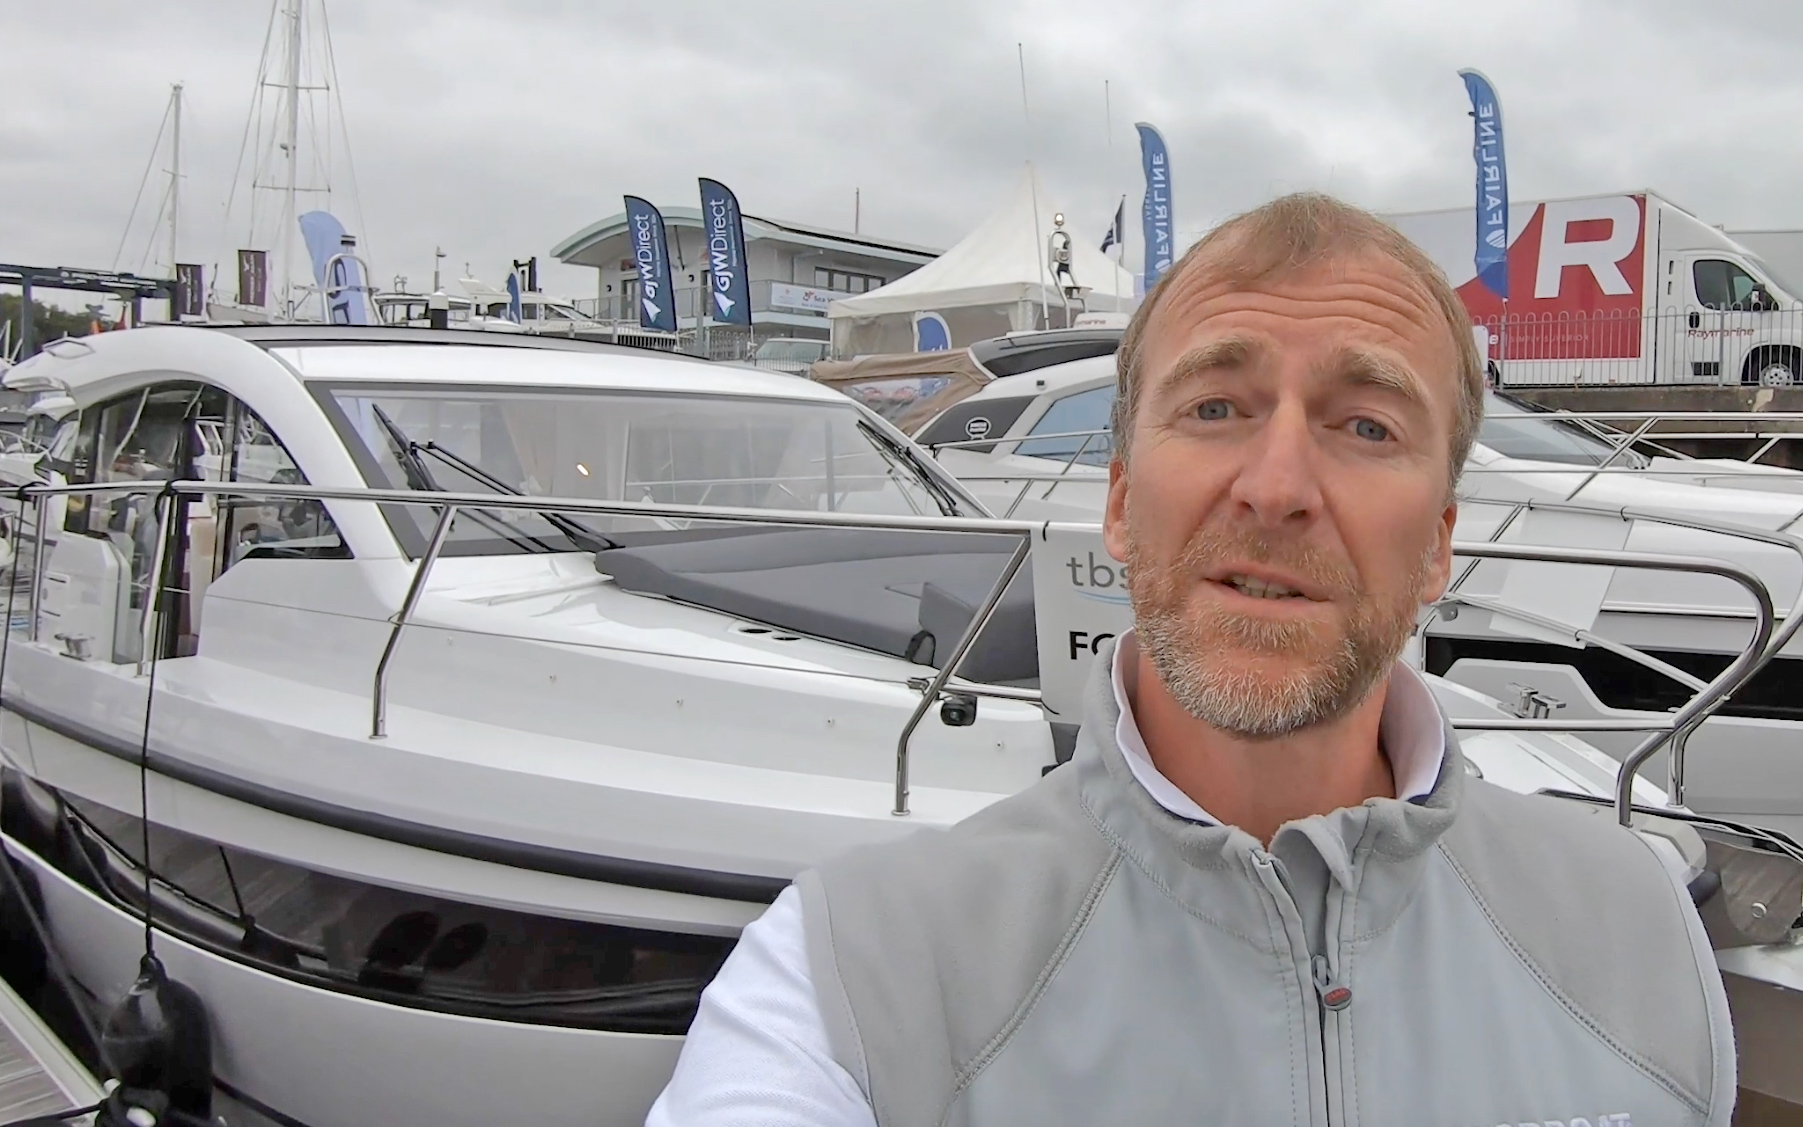 Sealine C335 yacht tour: Ringing the changes on this £266k sportscruiser